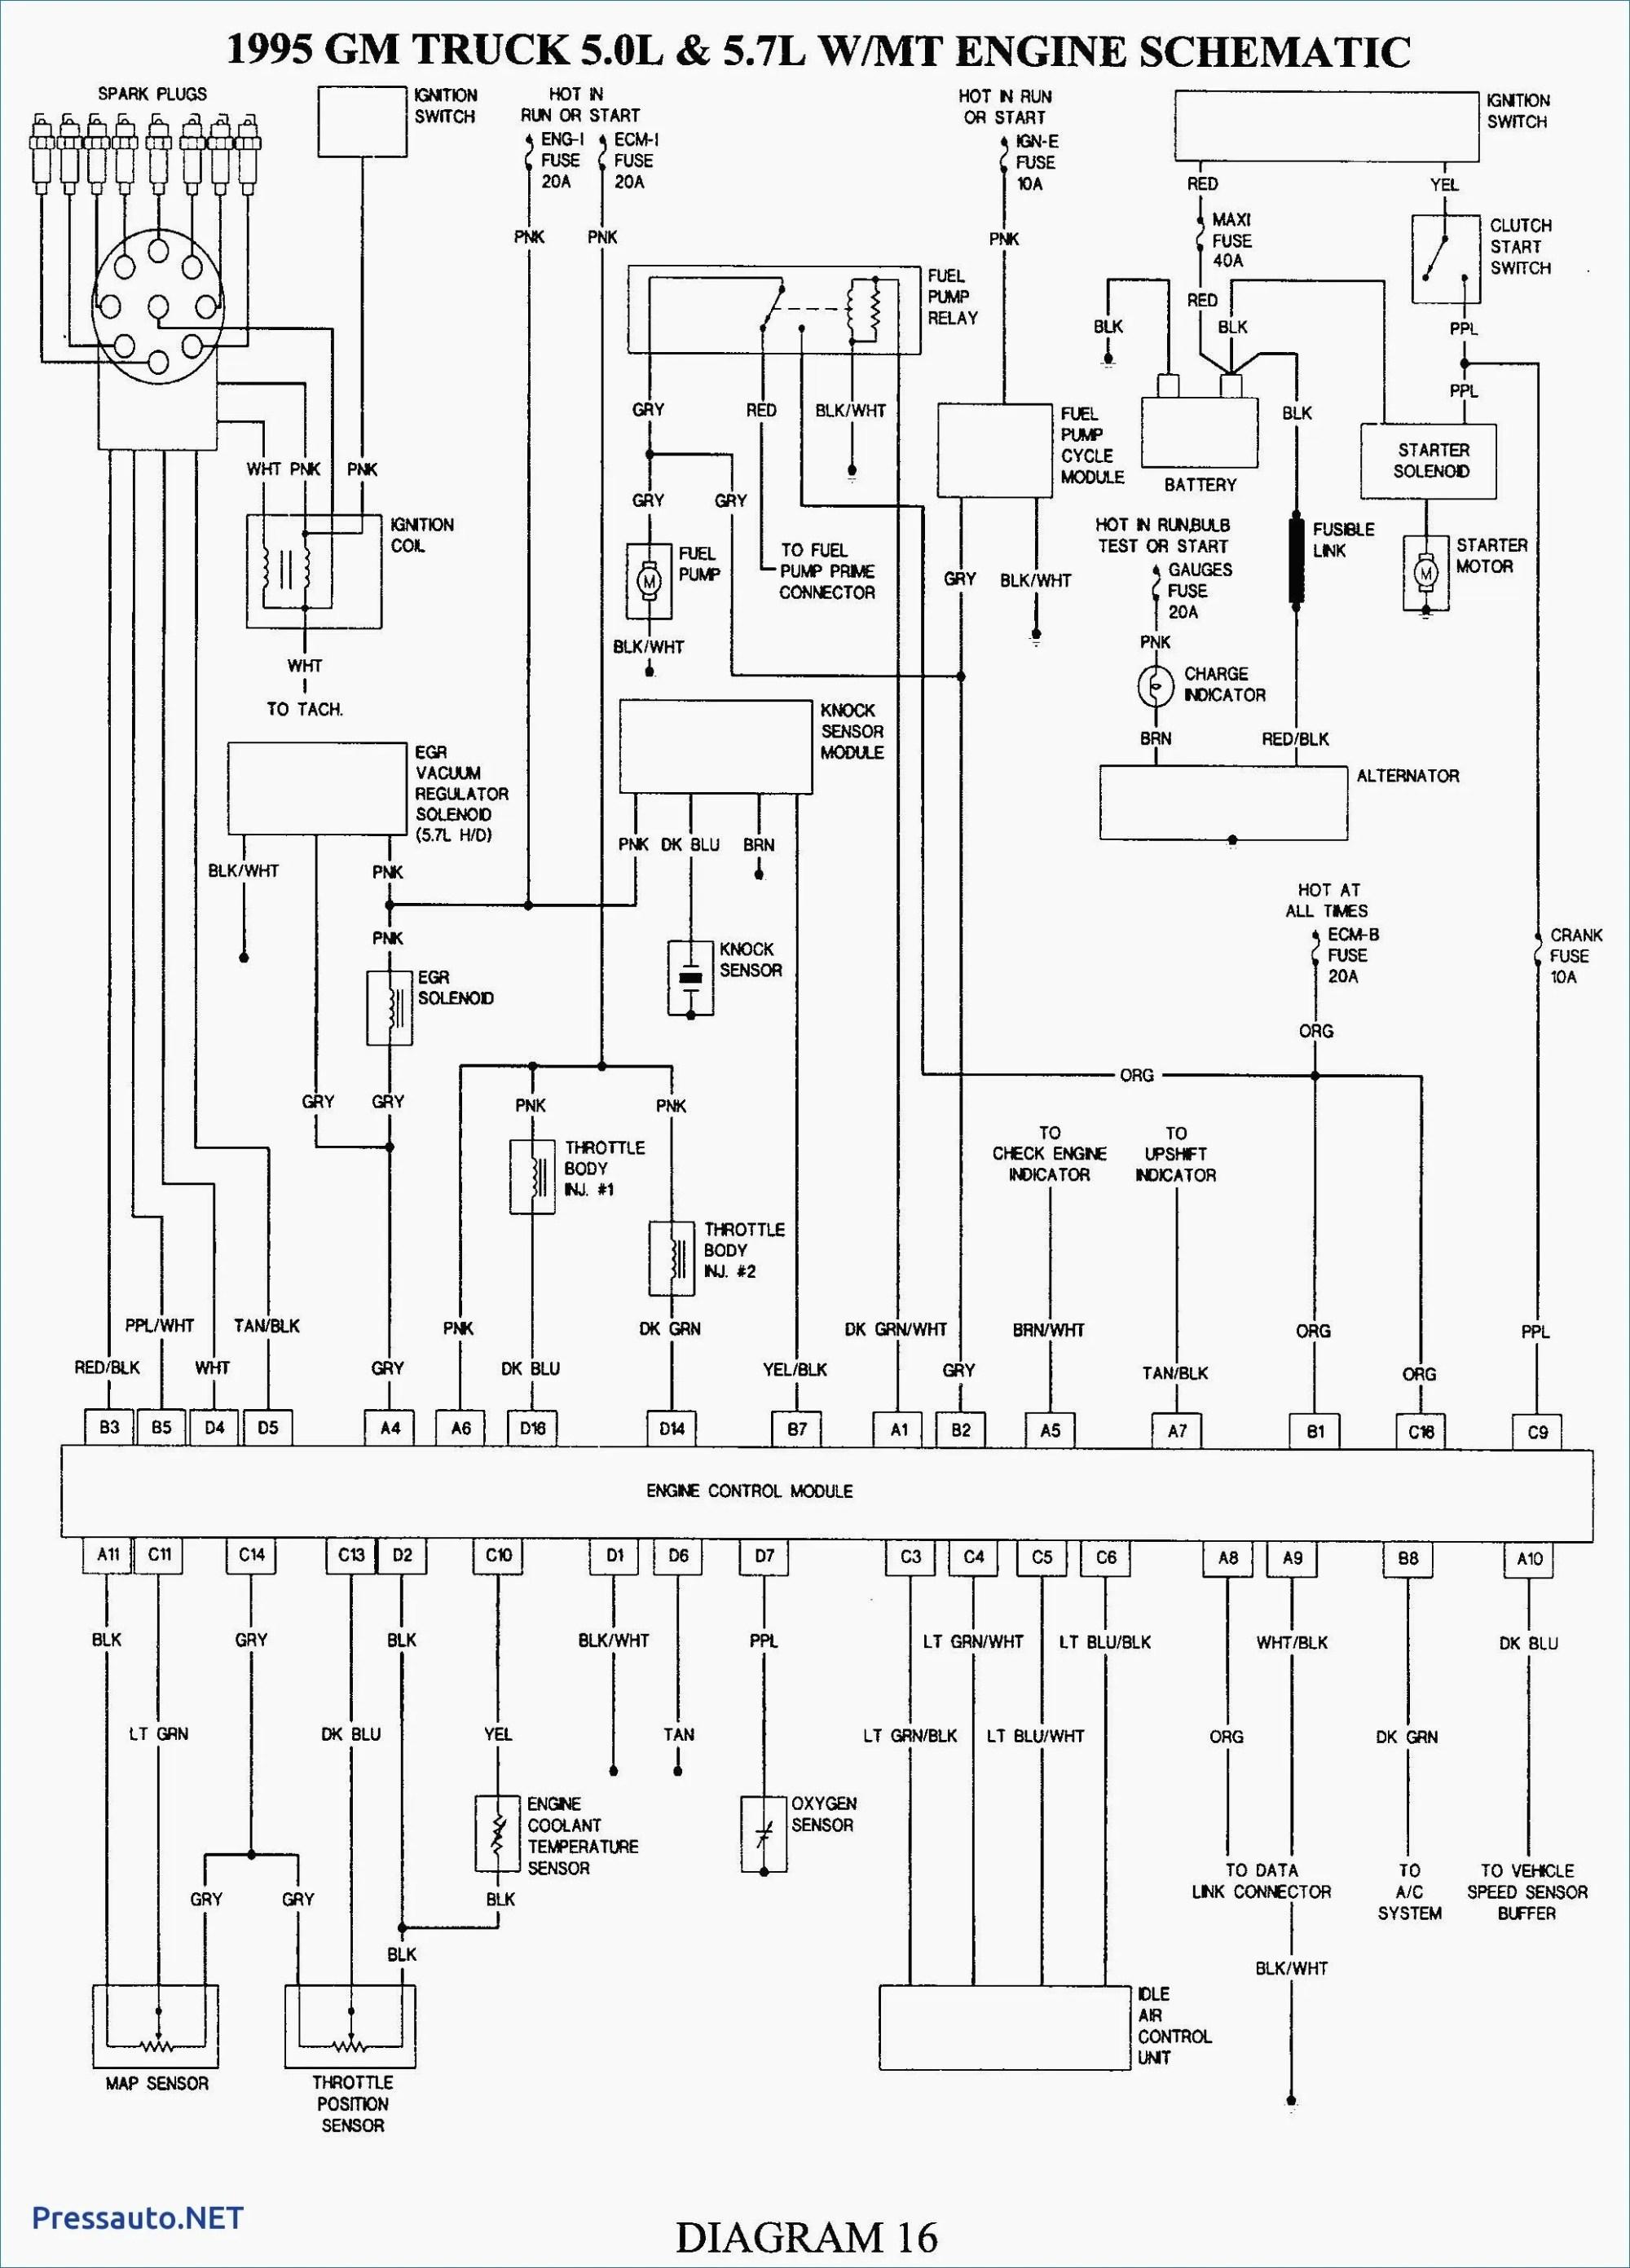 hight resolution of 1995 mack truck wire diagrams wiring library rh 98 akszer eu gm factory wiring diagram cummins